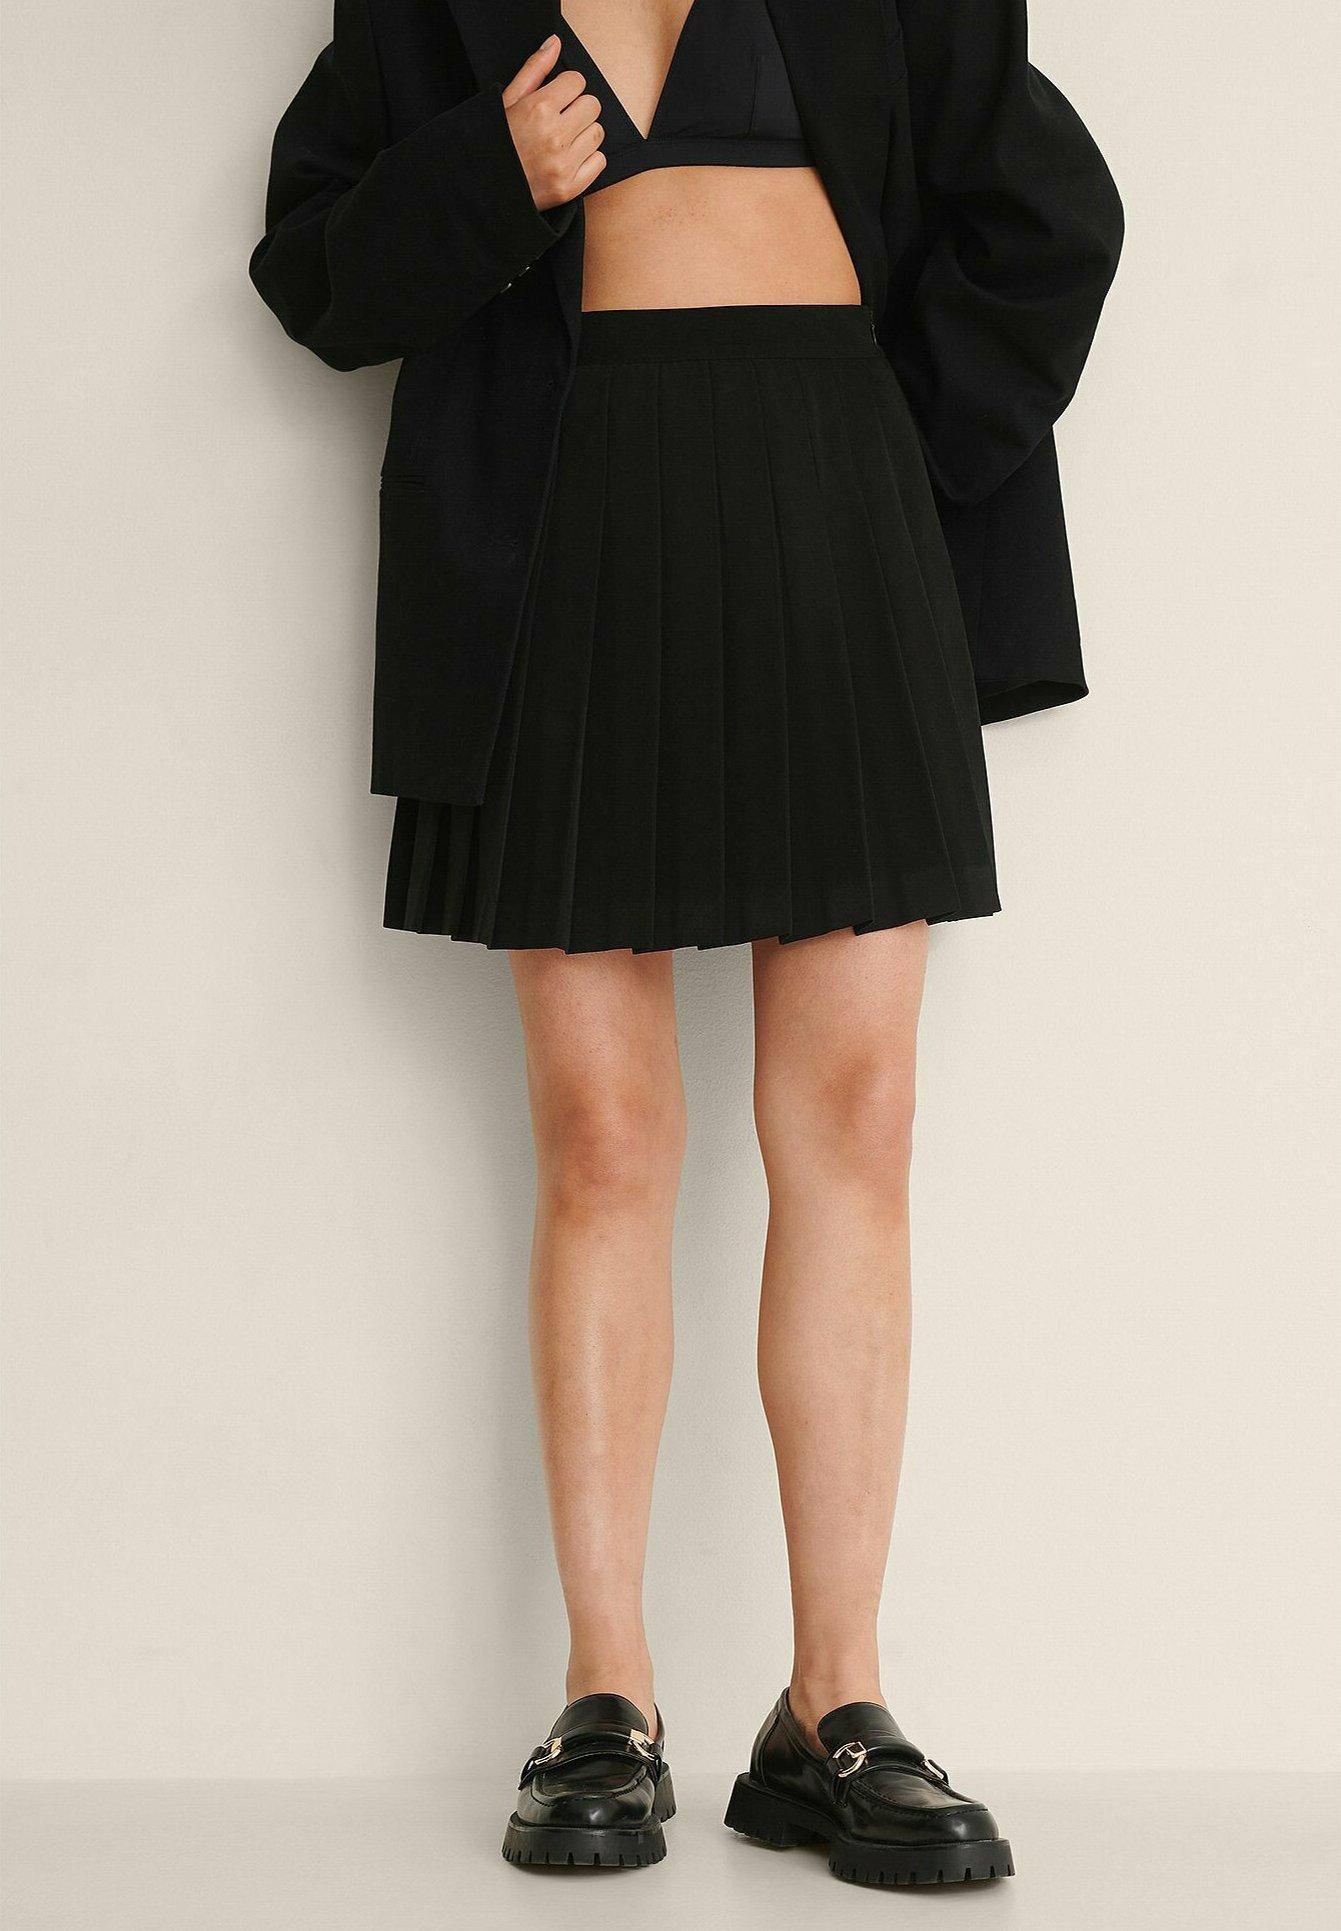 Femme RECYCELTER PLISSIERTER MINI-TENNIS - Jupe plissée